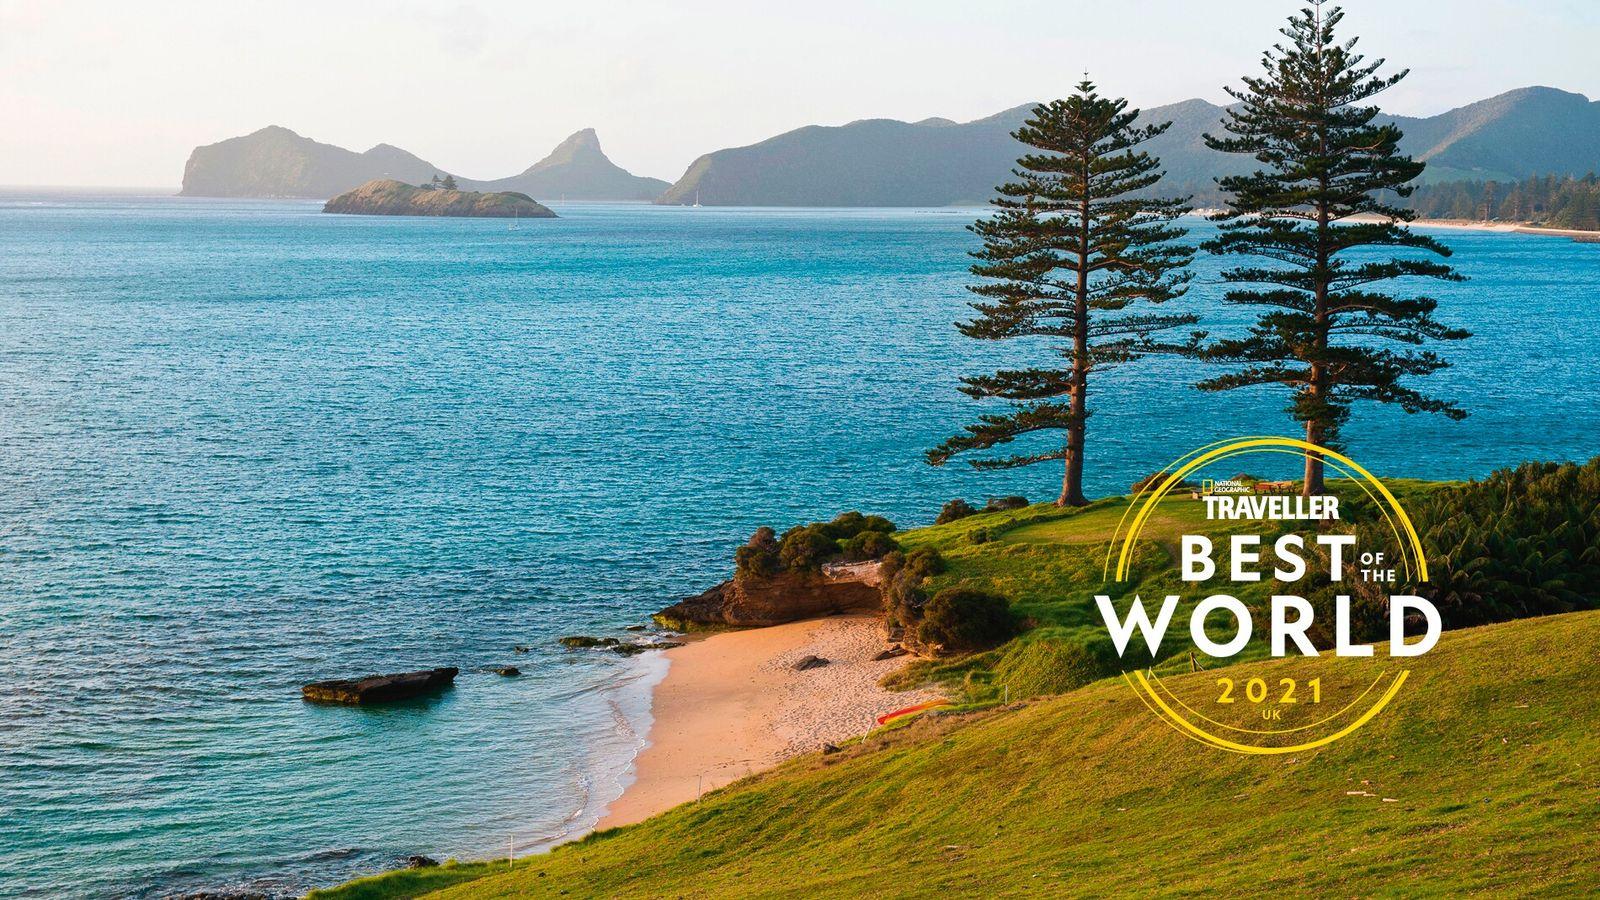 The coast of Lord Howe Island, New South Wales, Australia.